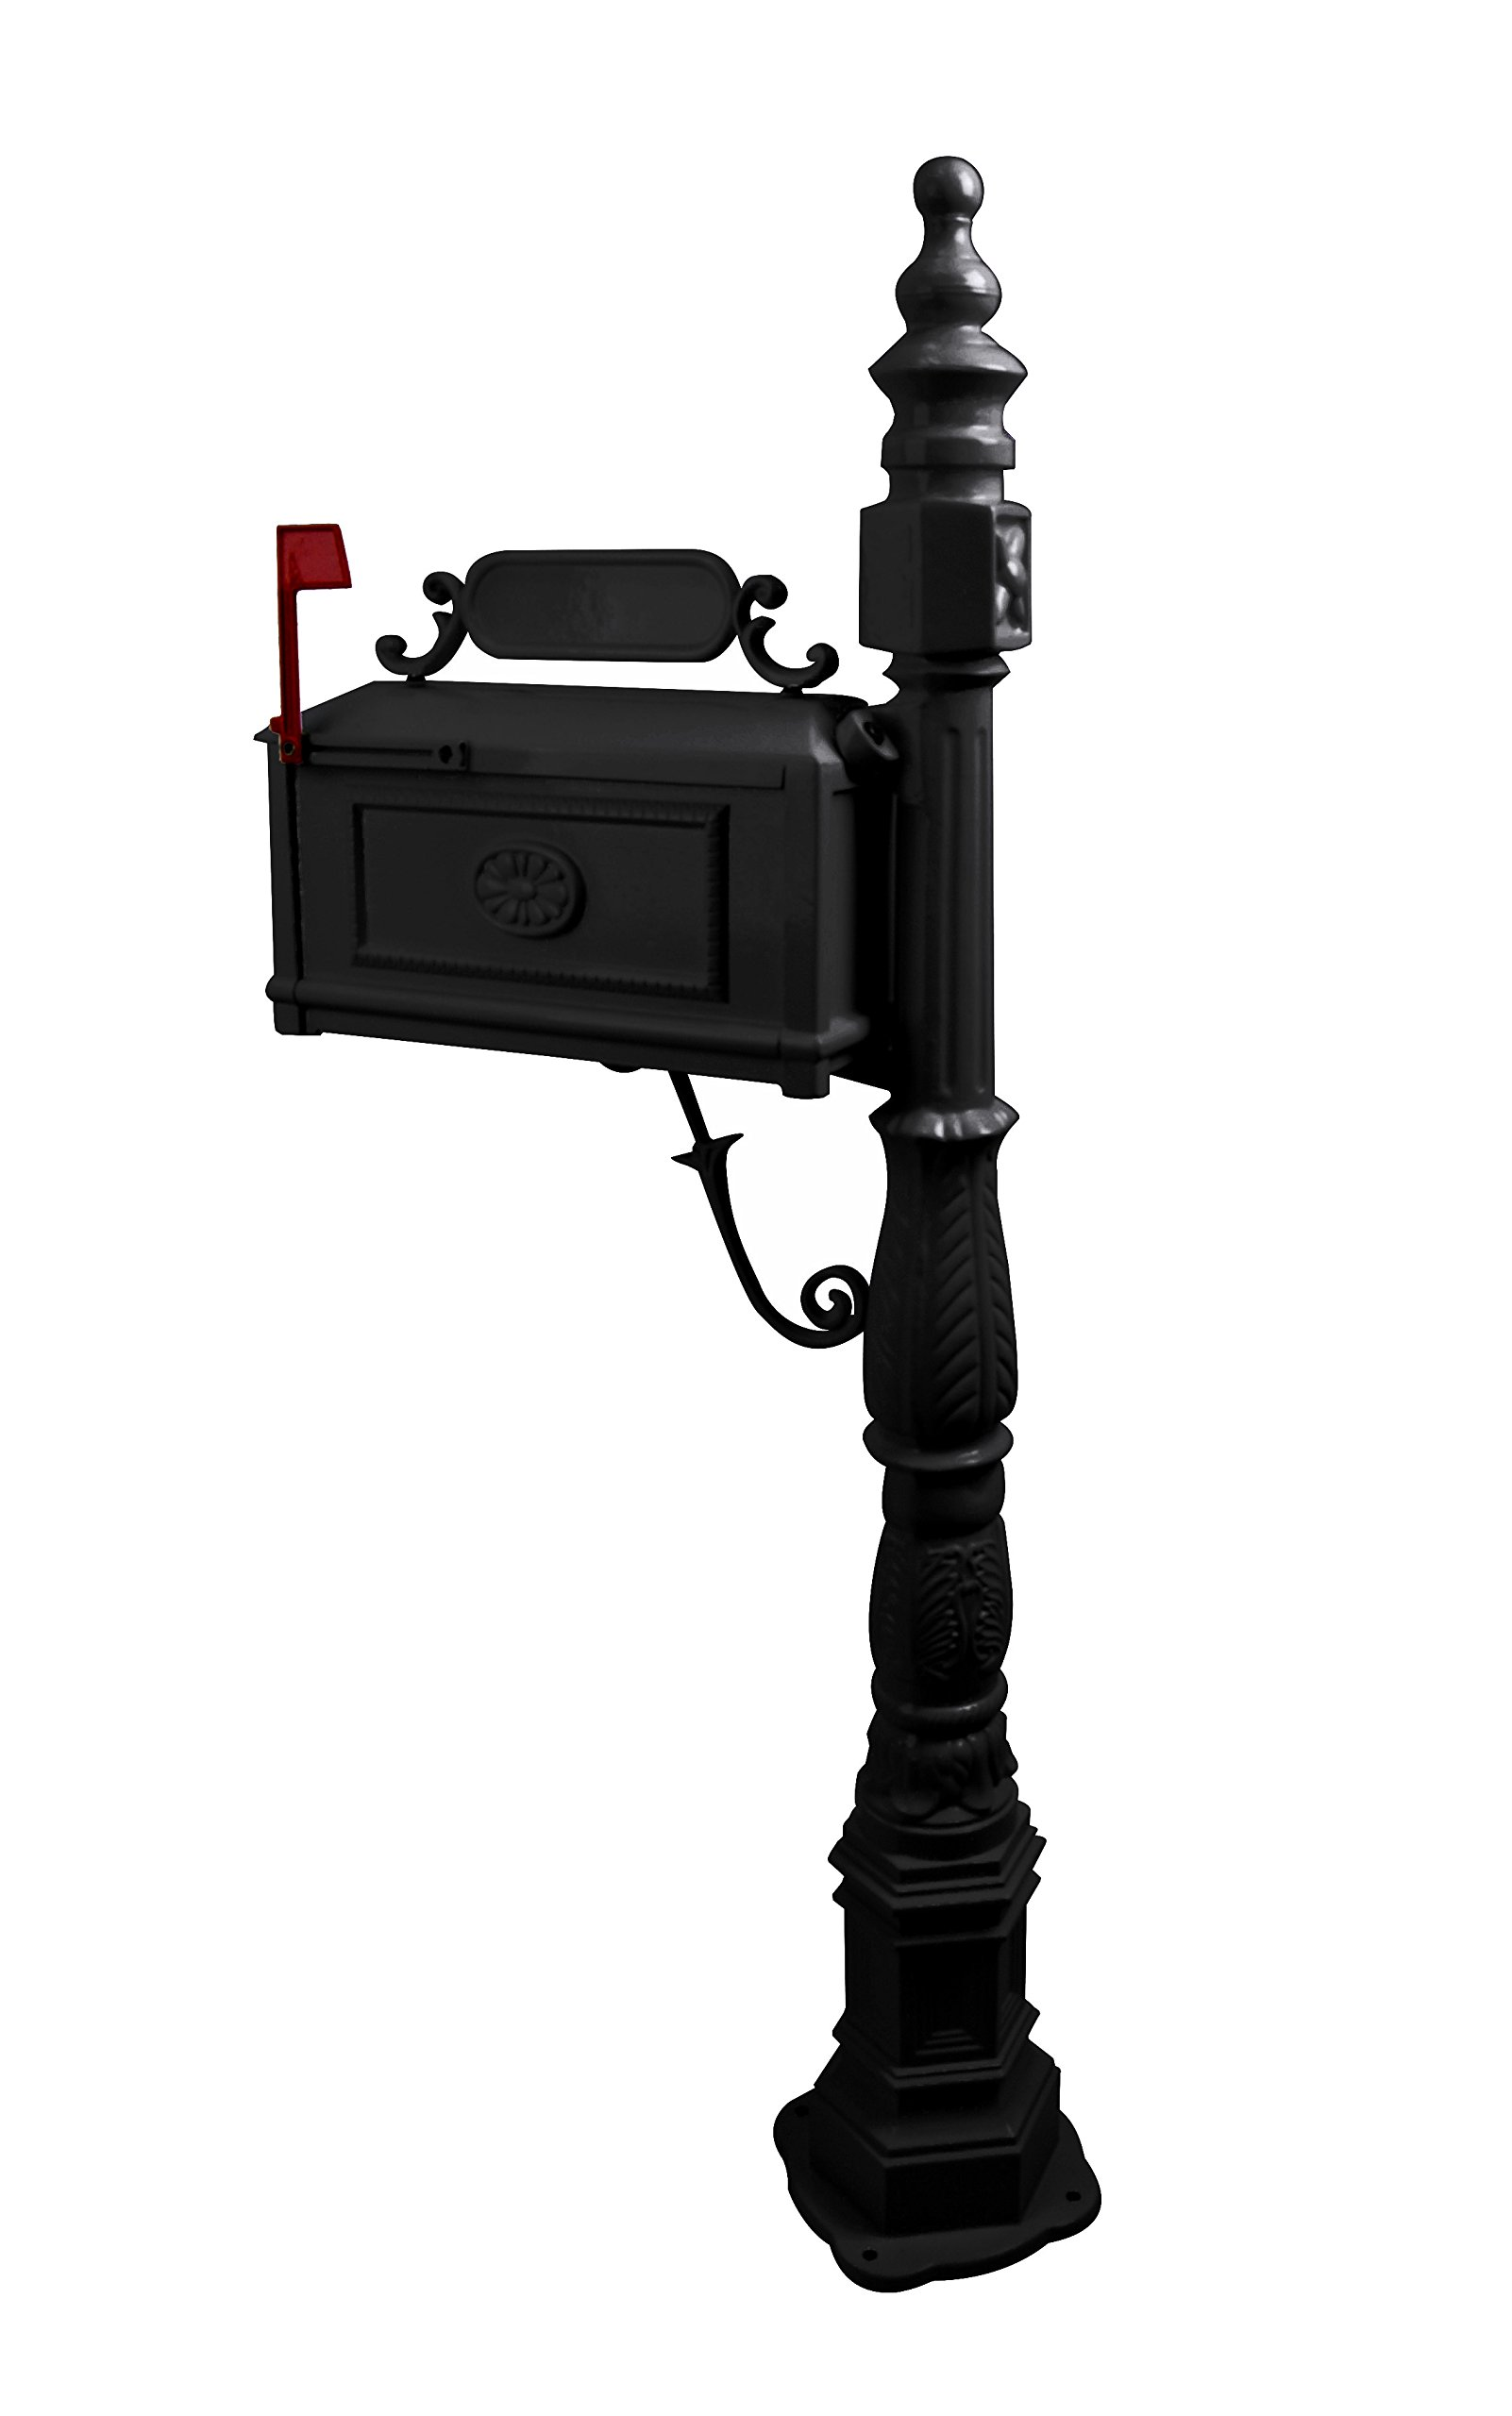 Post Mailbox Combination Stratford Heavy Duty Mail Box Cast Aluminum (Black) by Polar Aurora